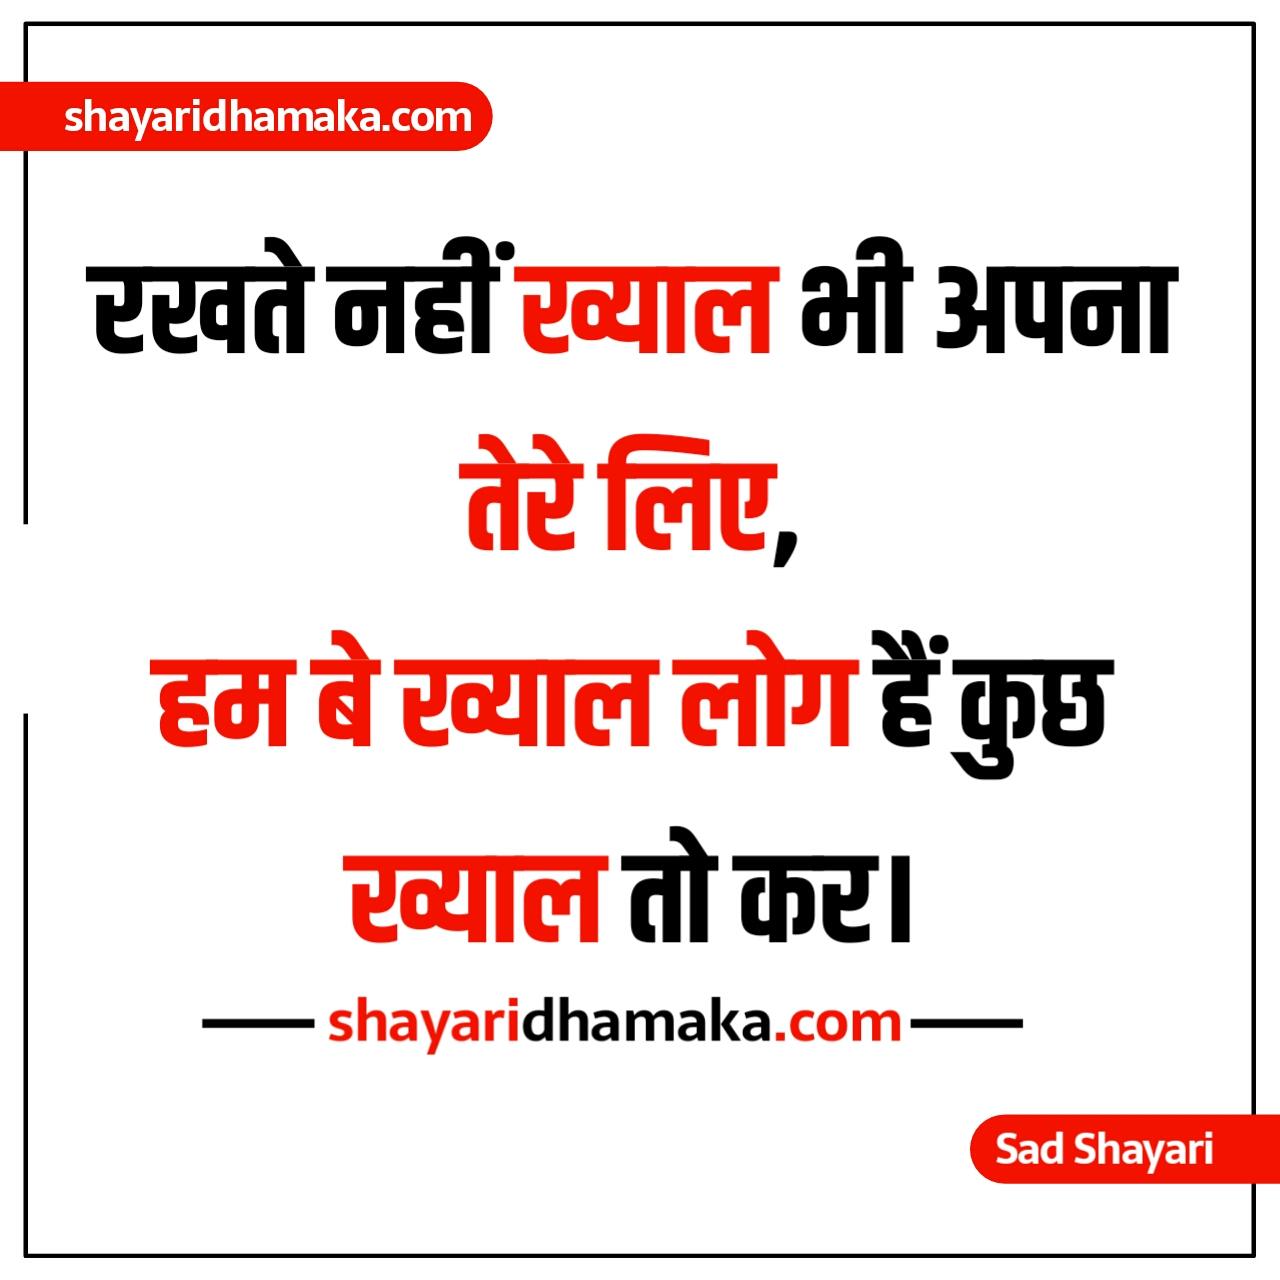 रखते नहीं ख्याल भी अपना तेरे लिए - Sad Shayari